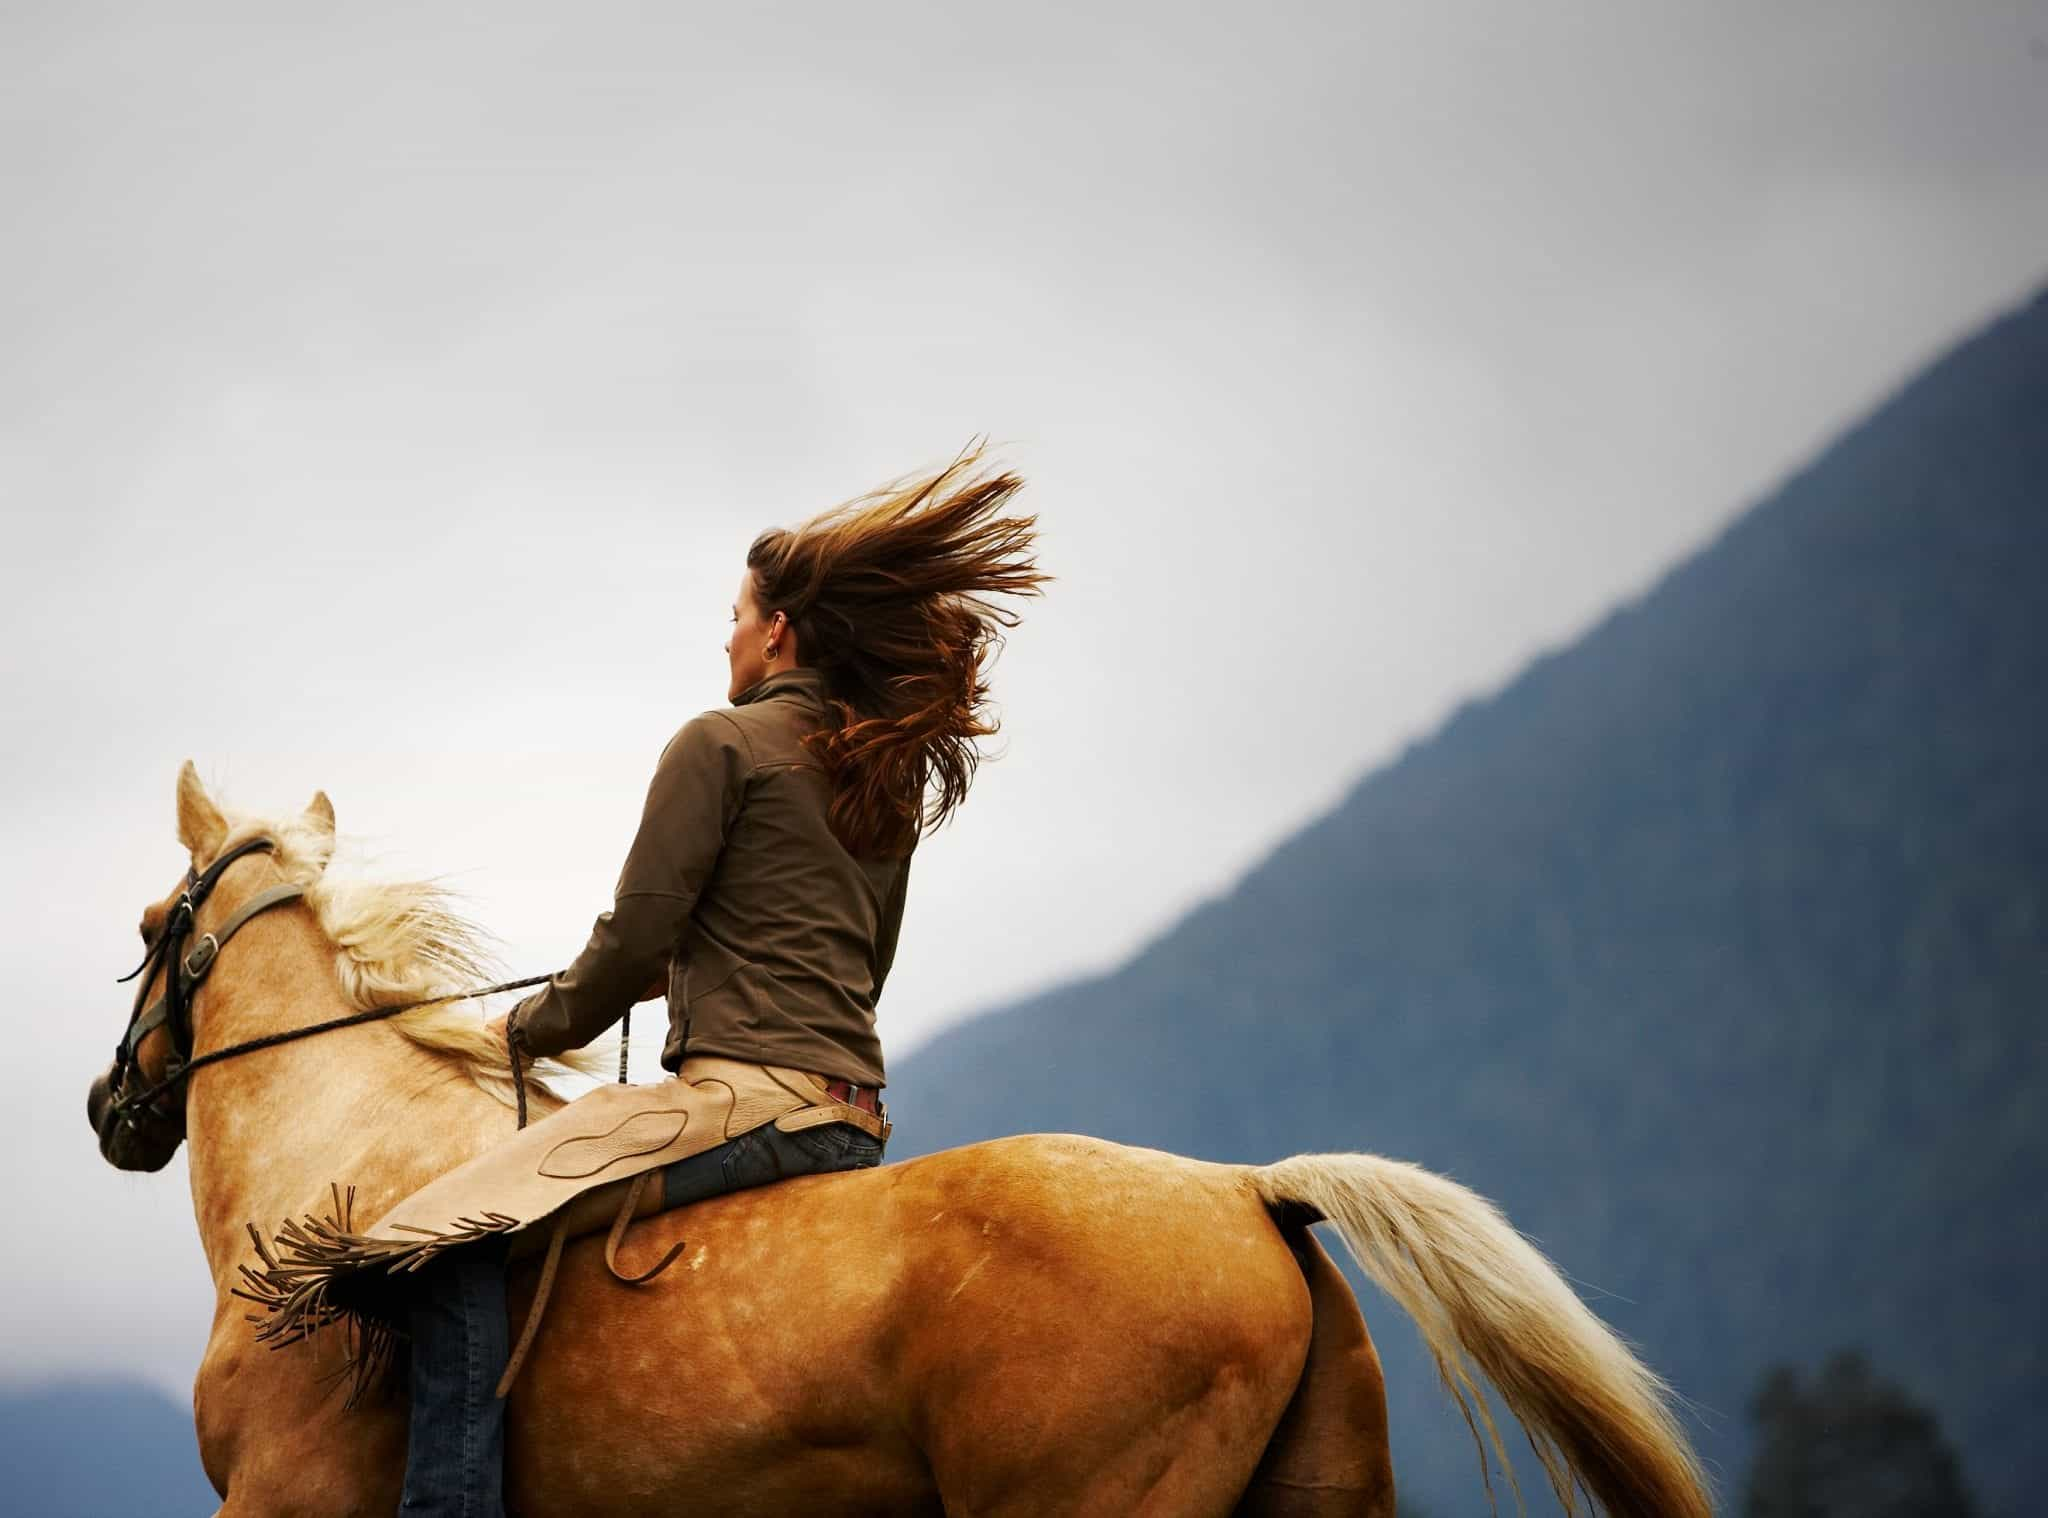 Woman riding horse bareback